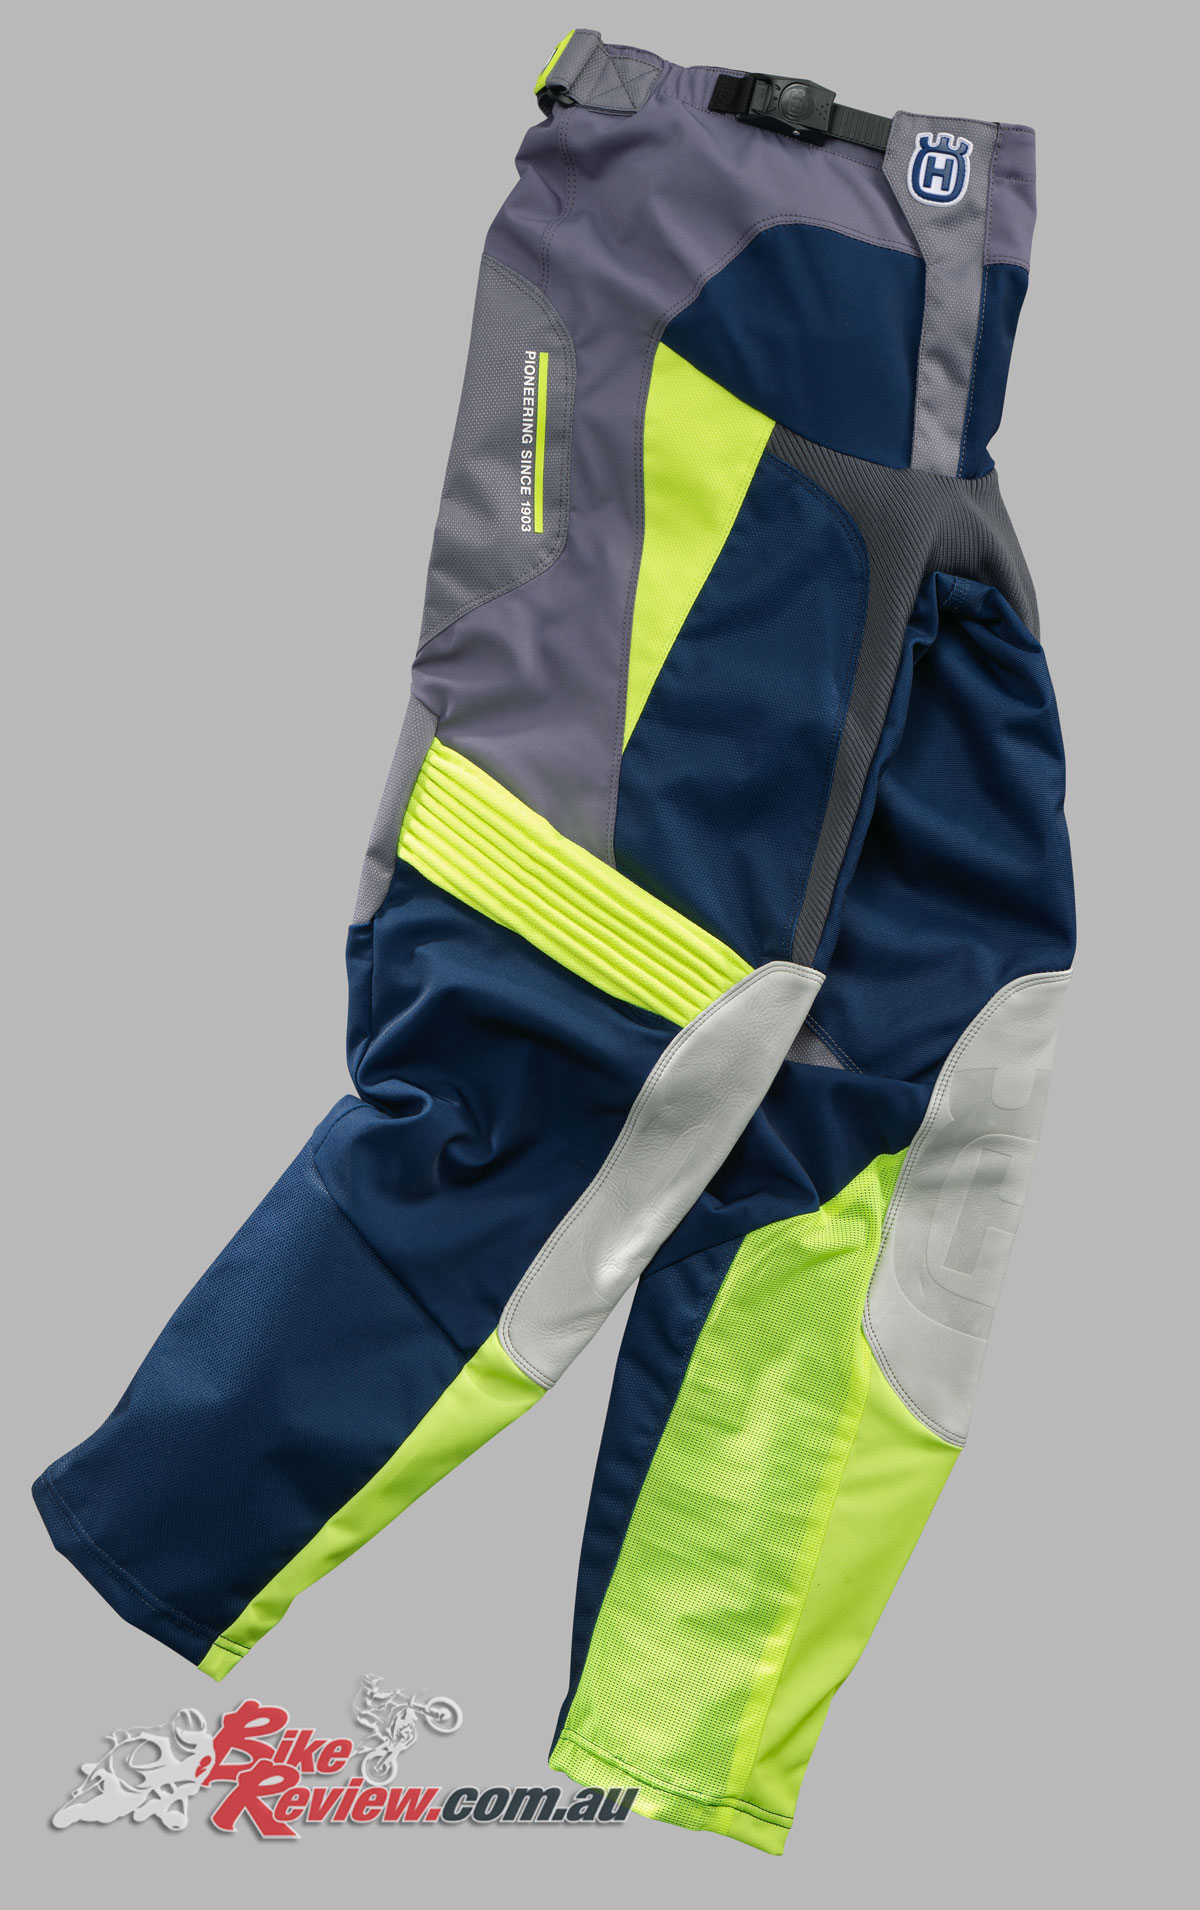 Husqvarna 2018 Railed pants